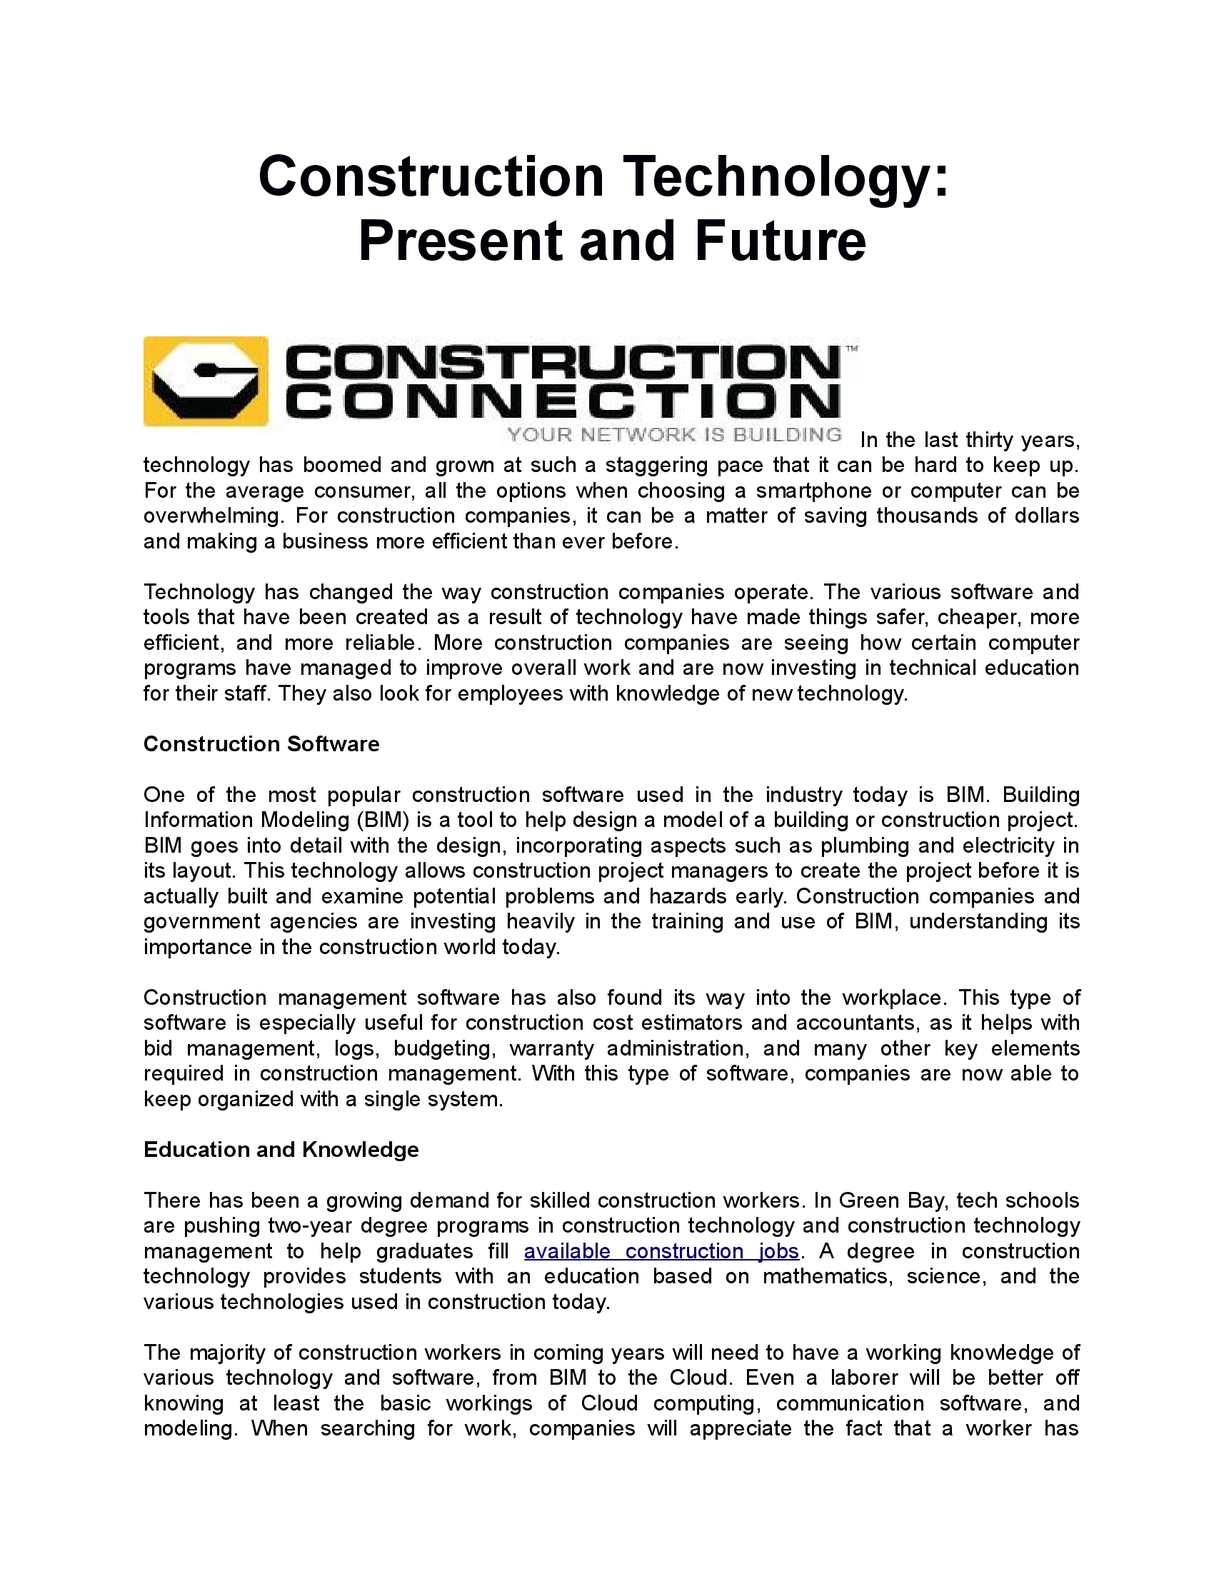 Calaméo Construction Technology Present And Future